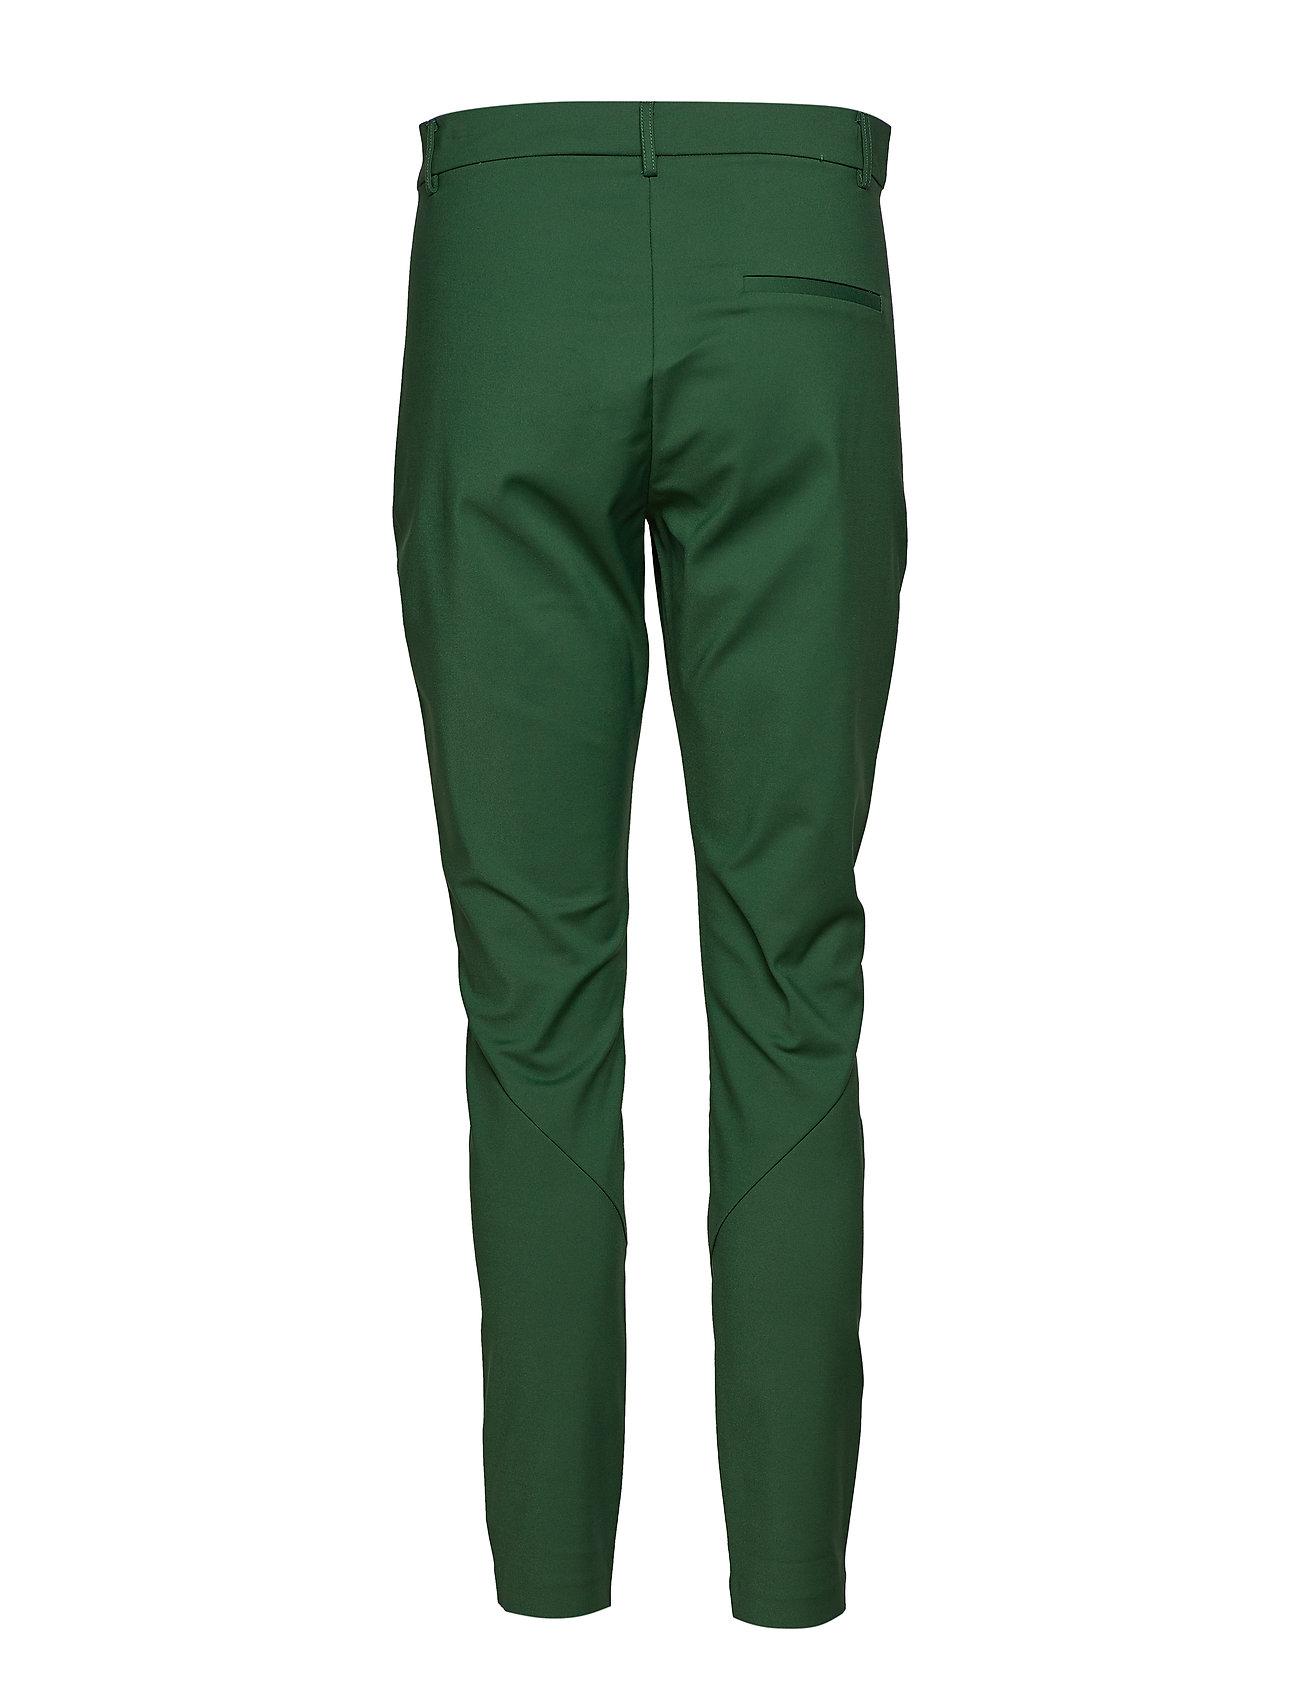 Coster Copenhagen Classic Long Pants - Stella (Night Sky Blue), 719.20